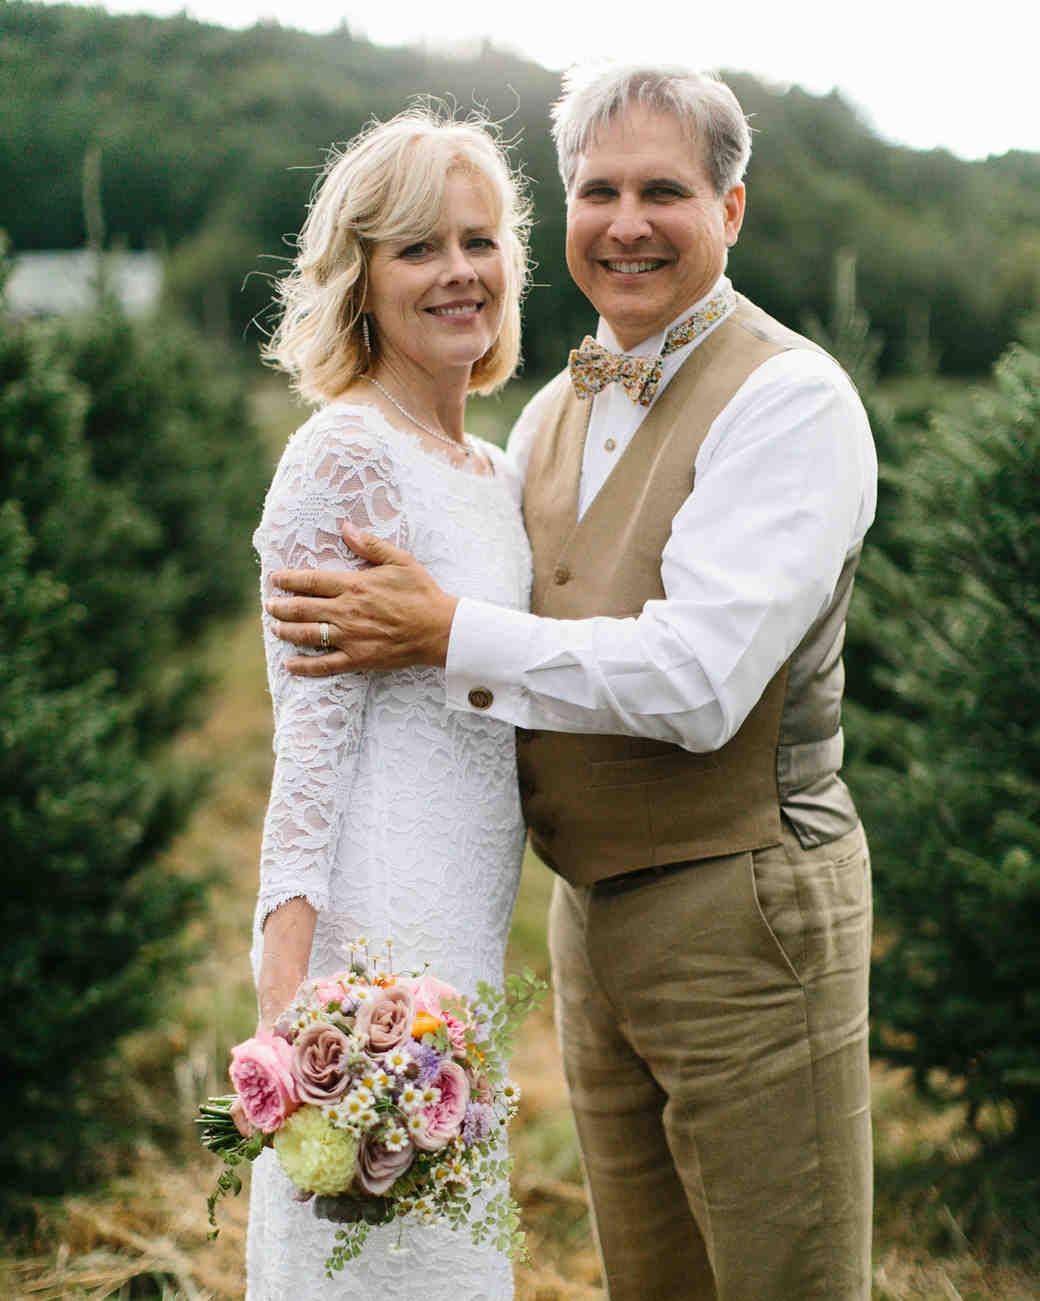 sandy-dwight-wedding-portrait1-0514.jpg